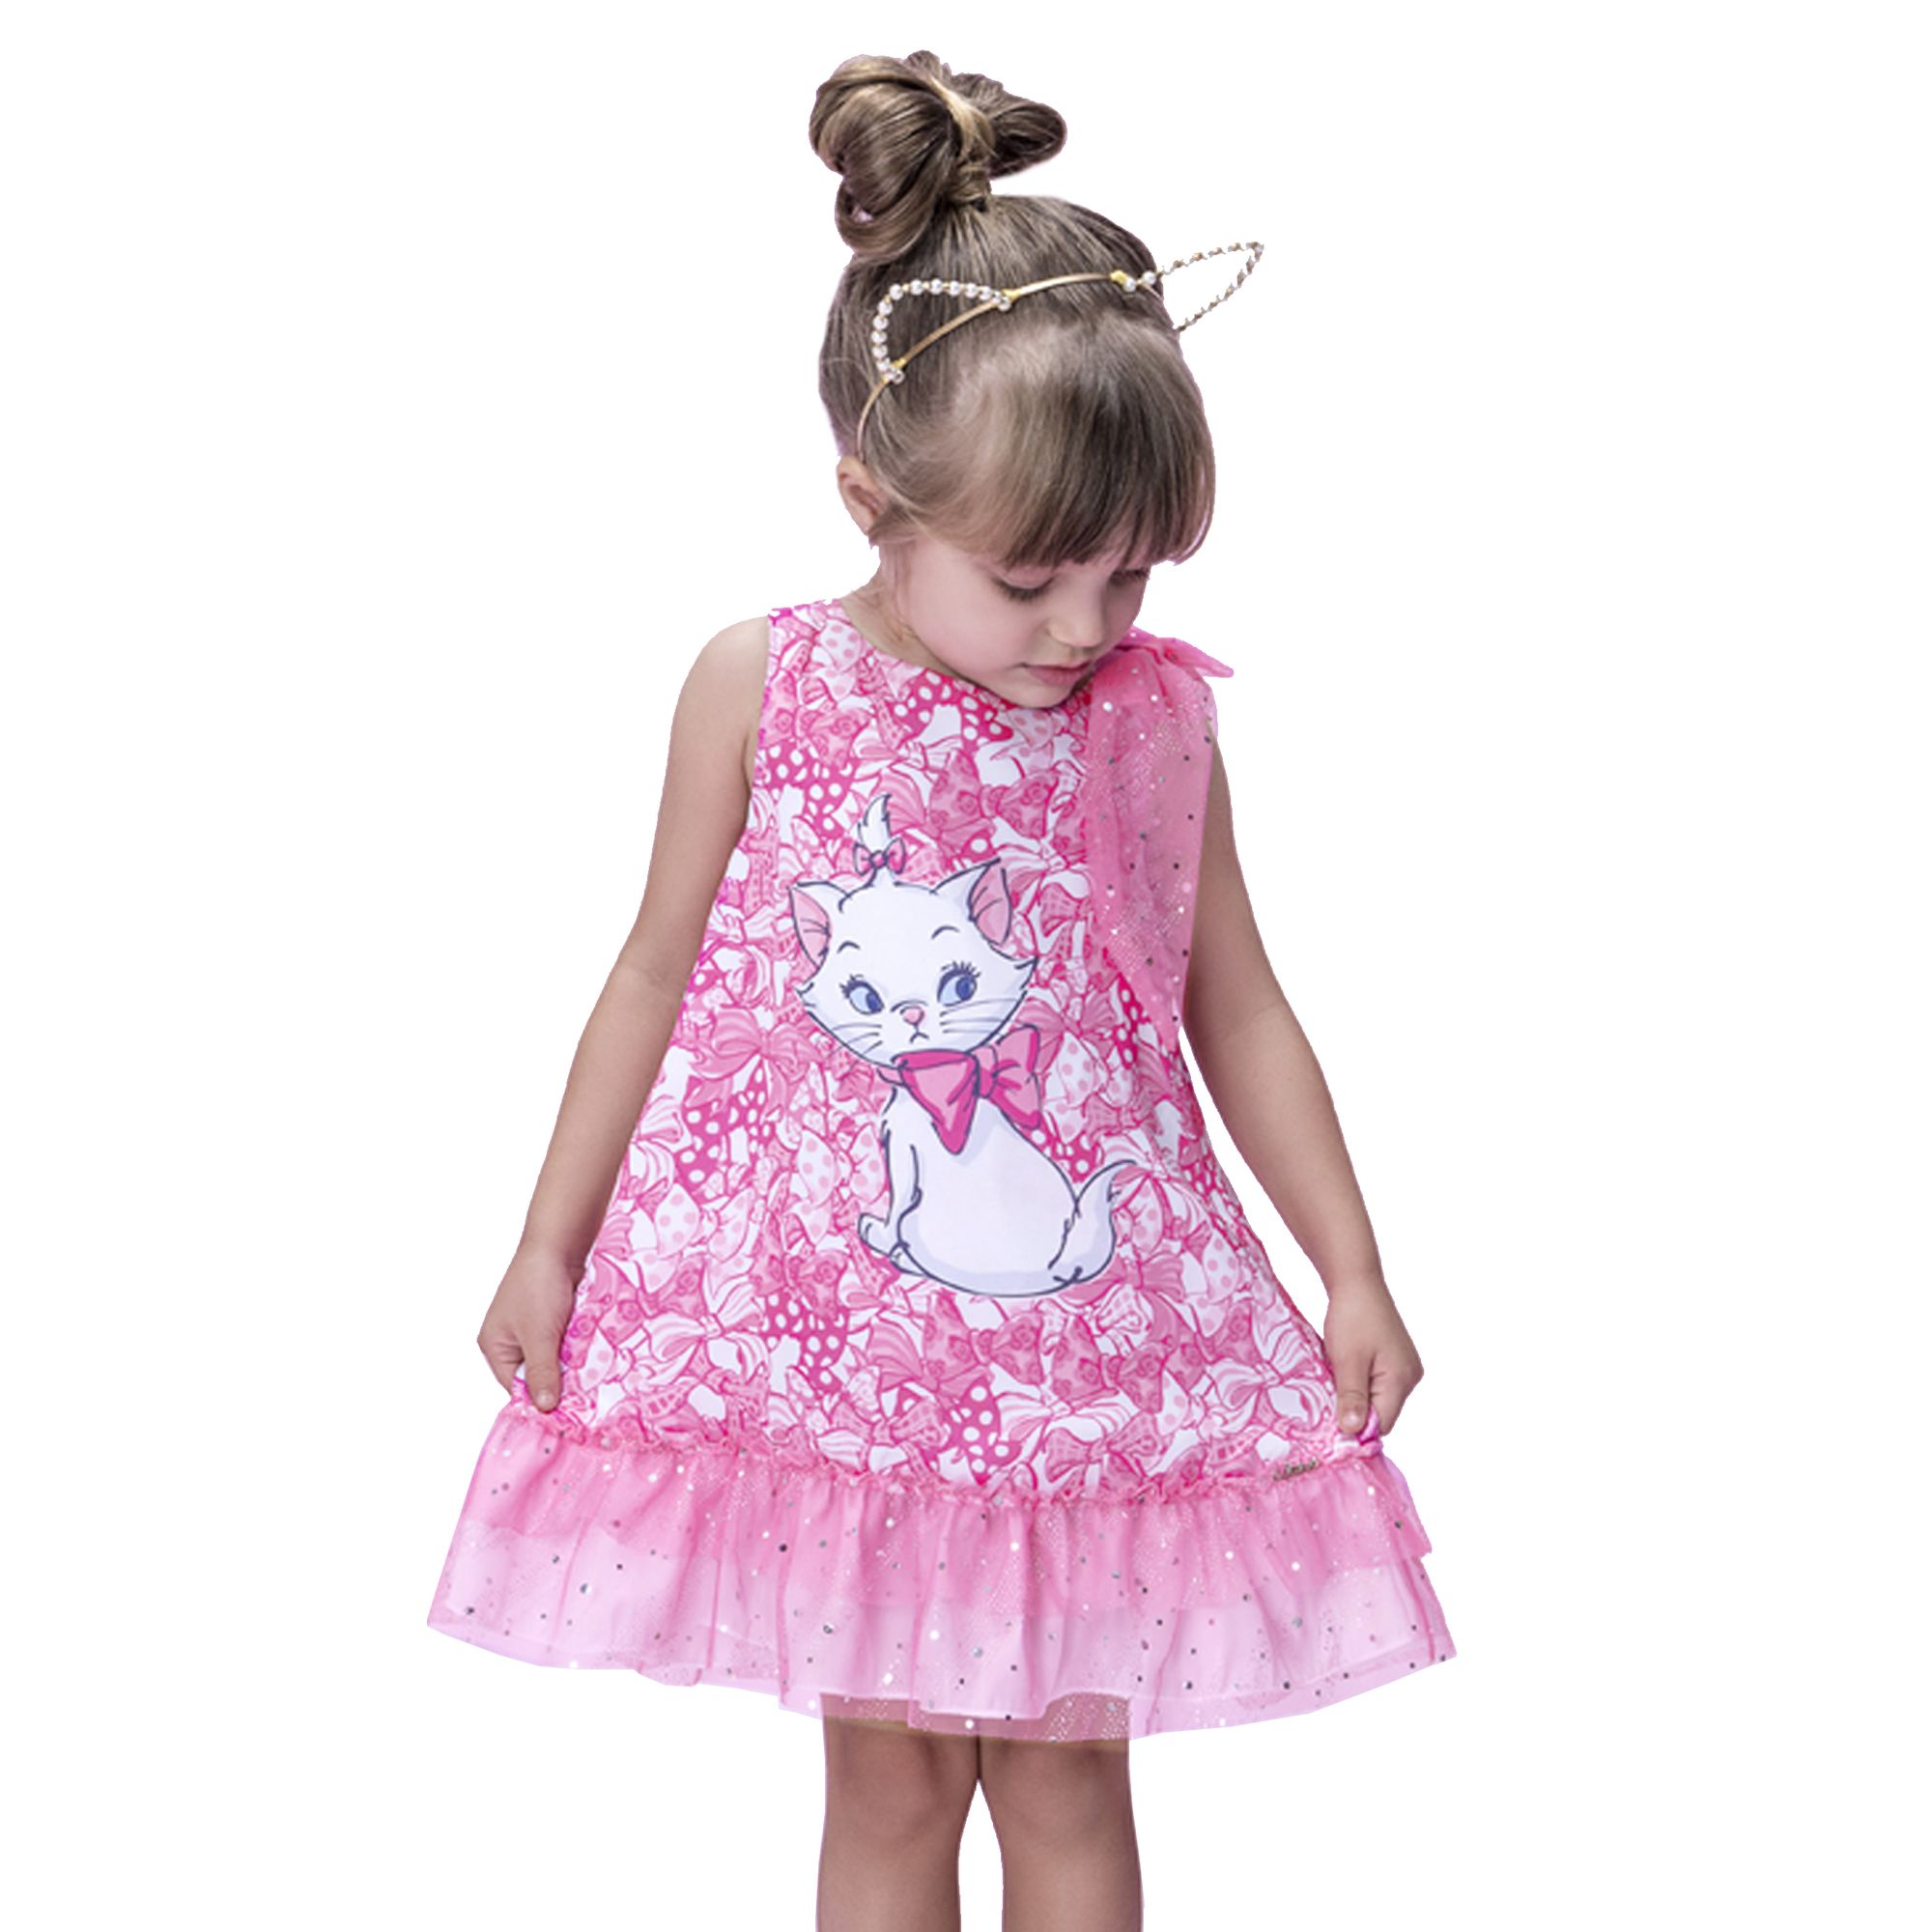 vestido-infantil-gata-marie-disnet-joy-by-morena-rosa